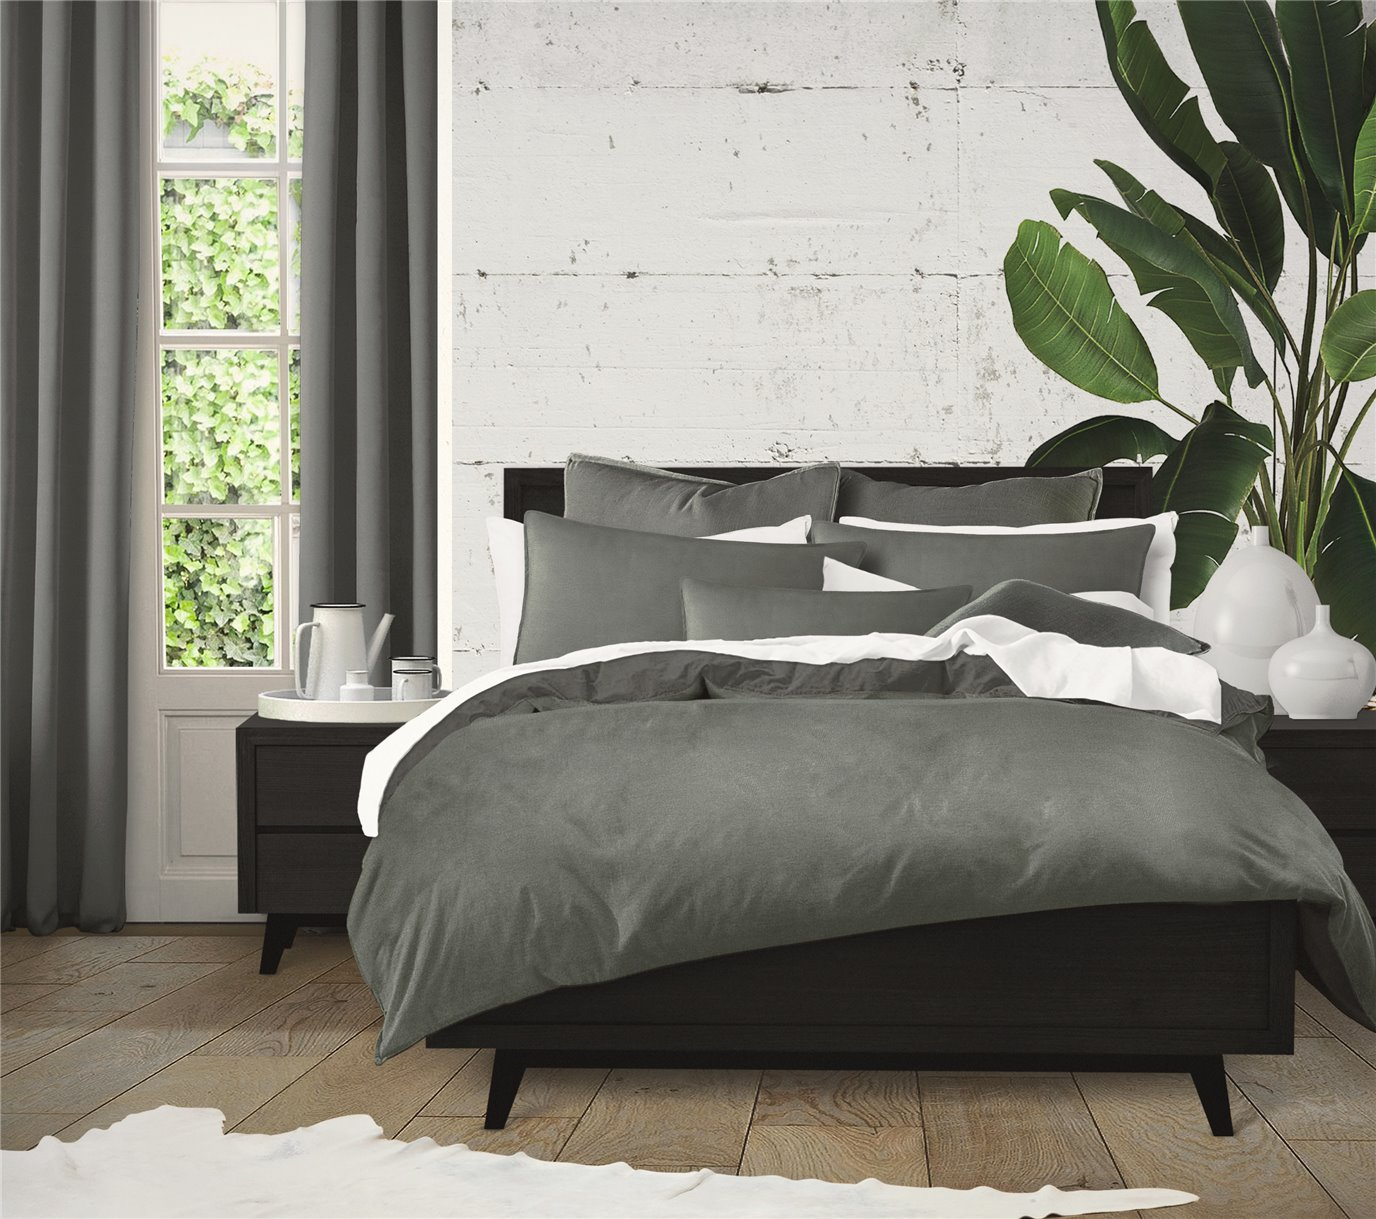 Harrow Charcoal Comforter Set - California King